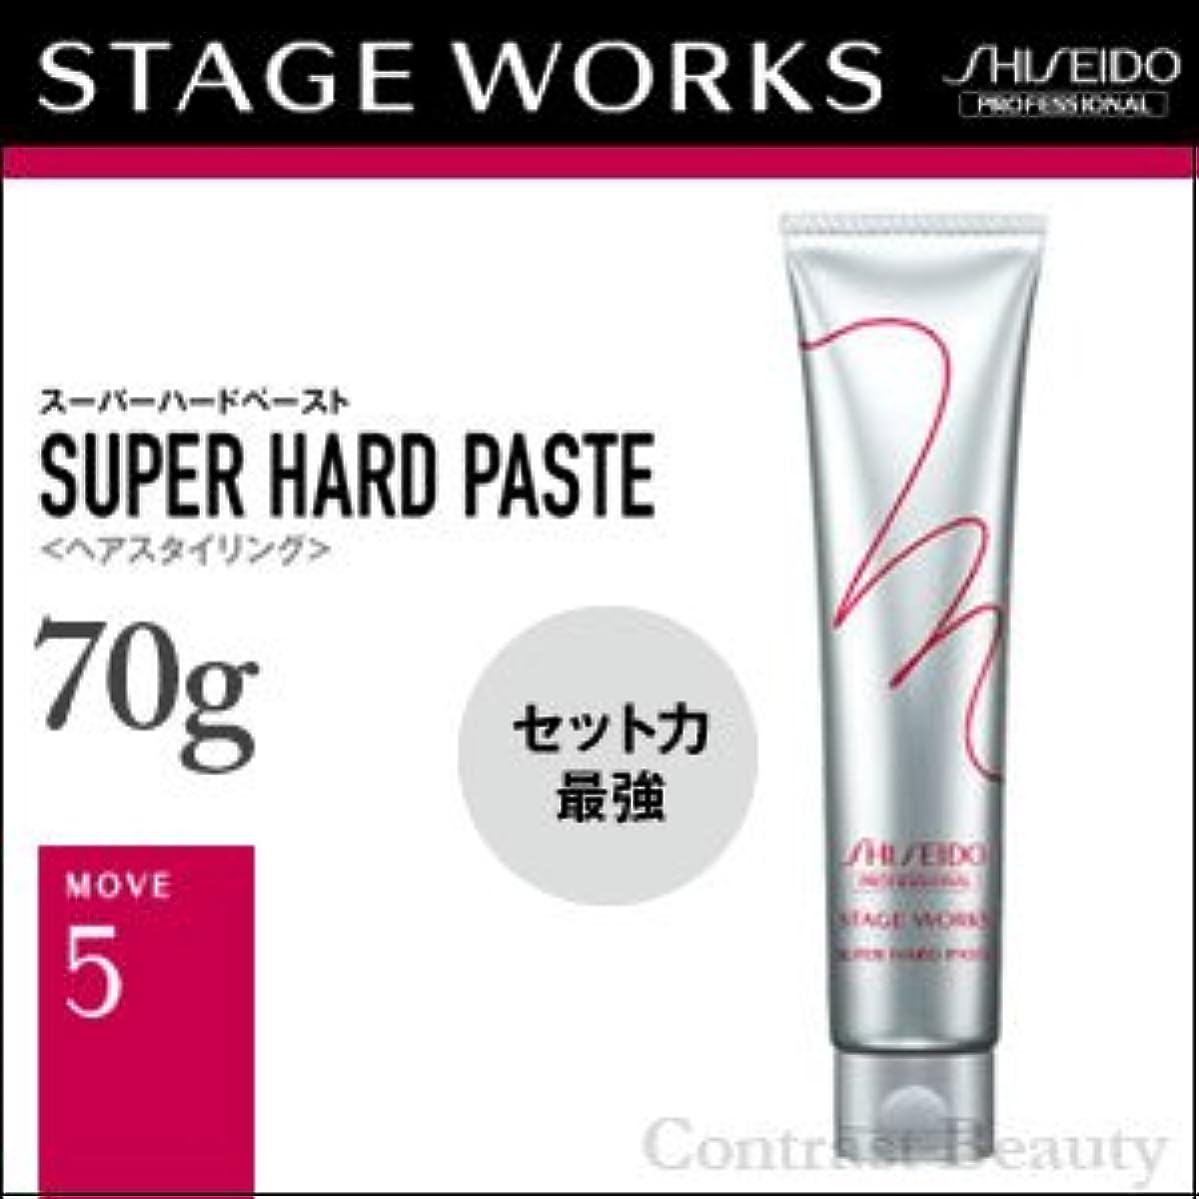 【x5個セット】 資生堂 ステージワークス ムーブ5 スーパーハードペースト 70g